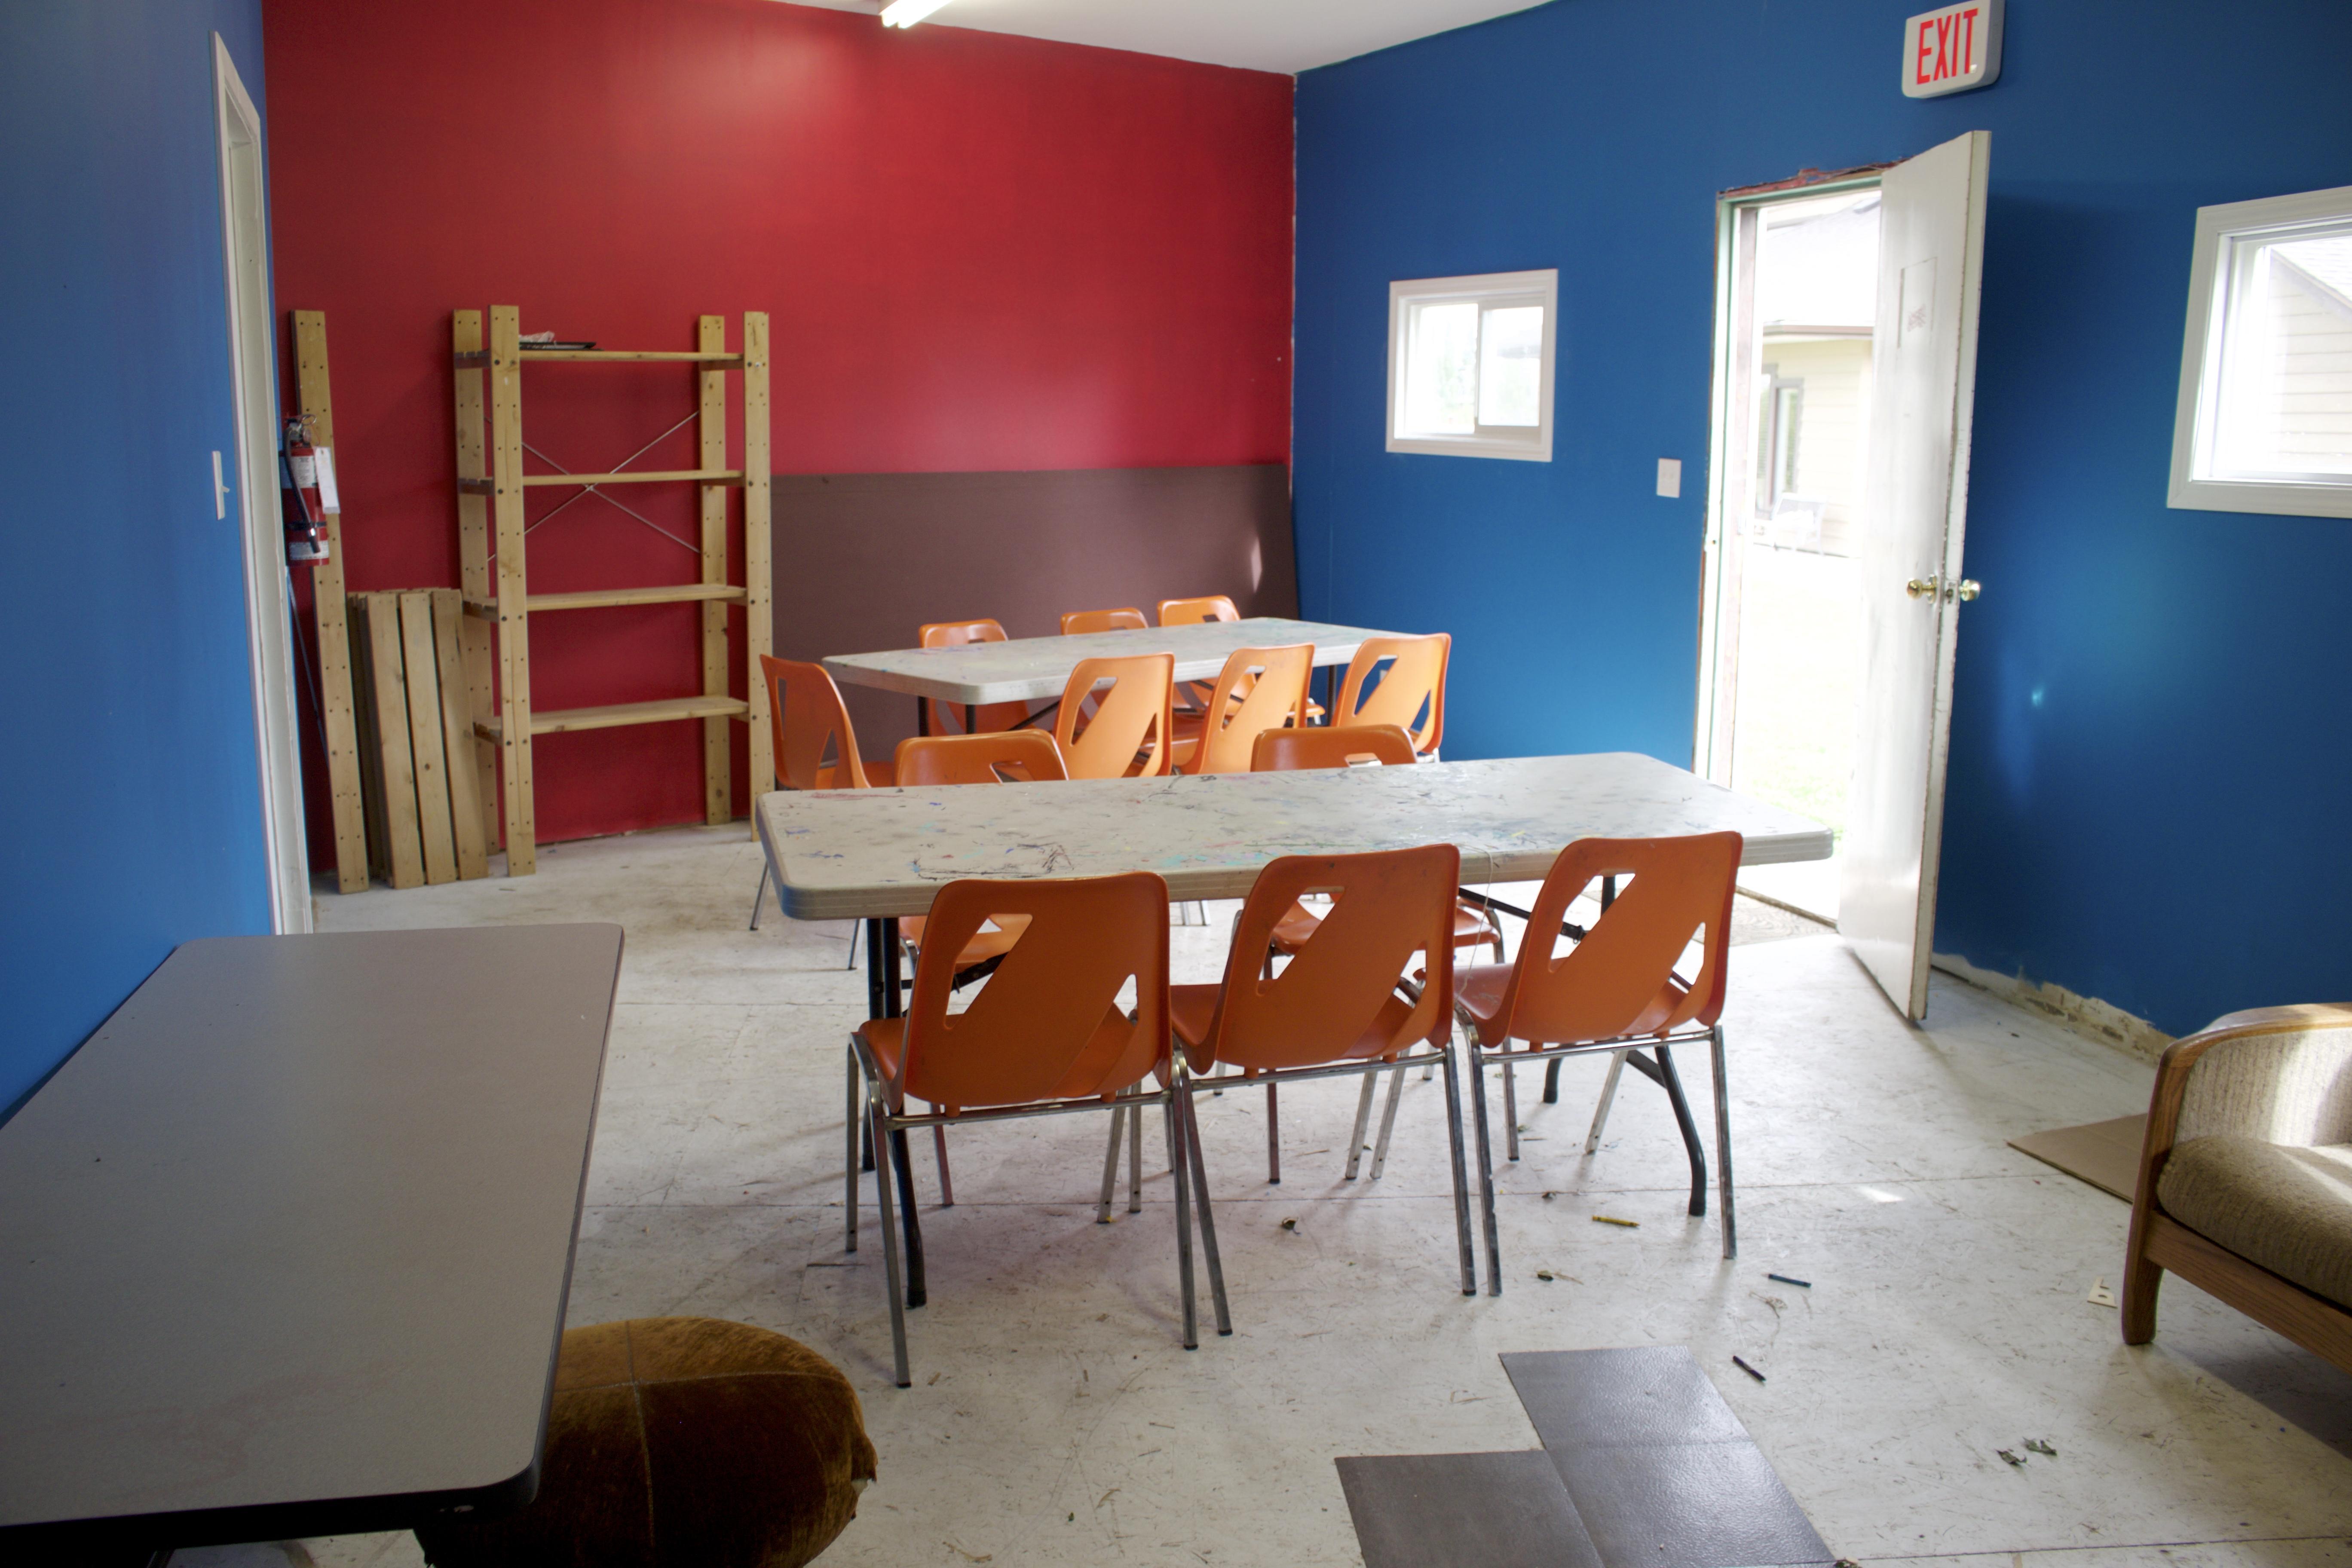 Chap Activity Room